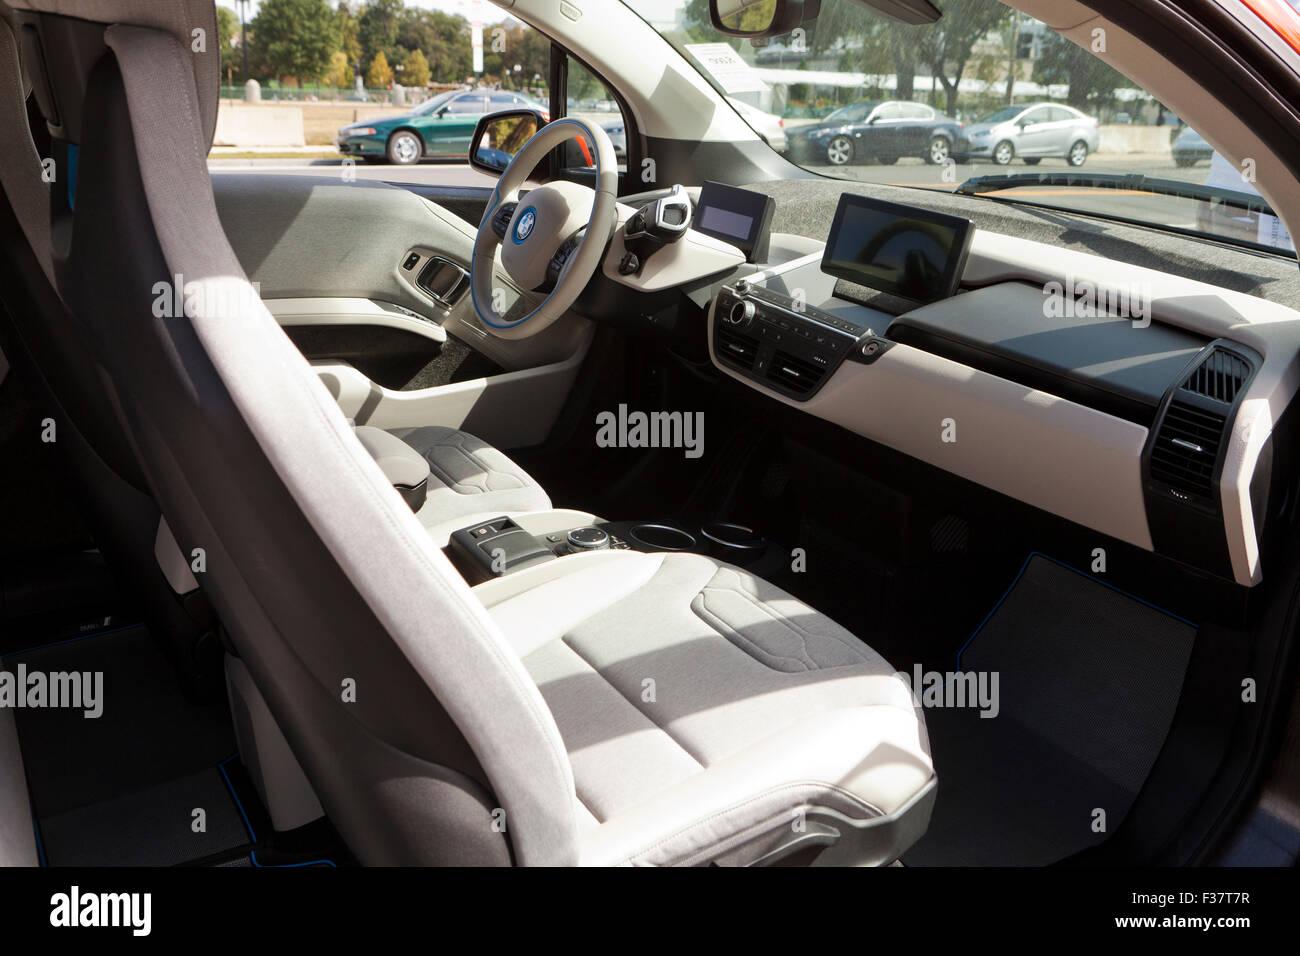 Bmw I3 Electric Car Interior Usa Stock Photo 88068507 Alamy